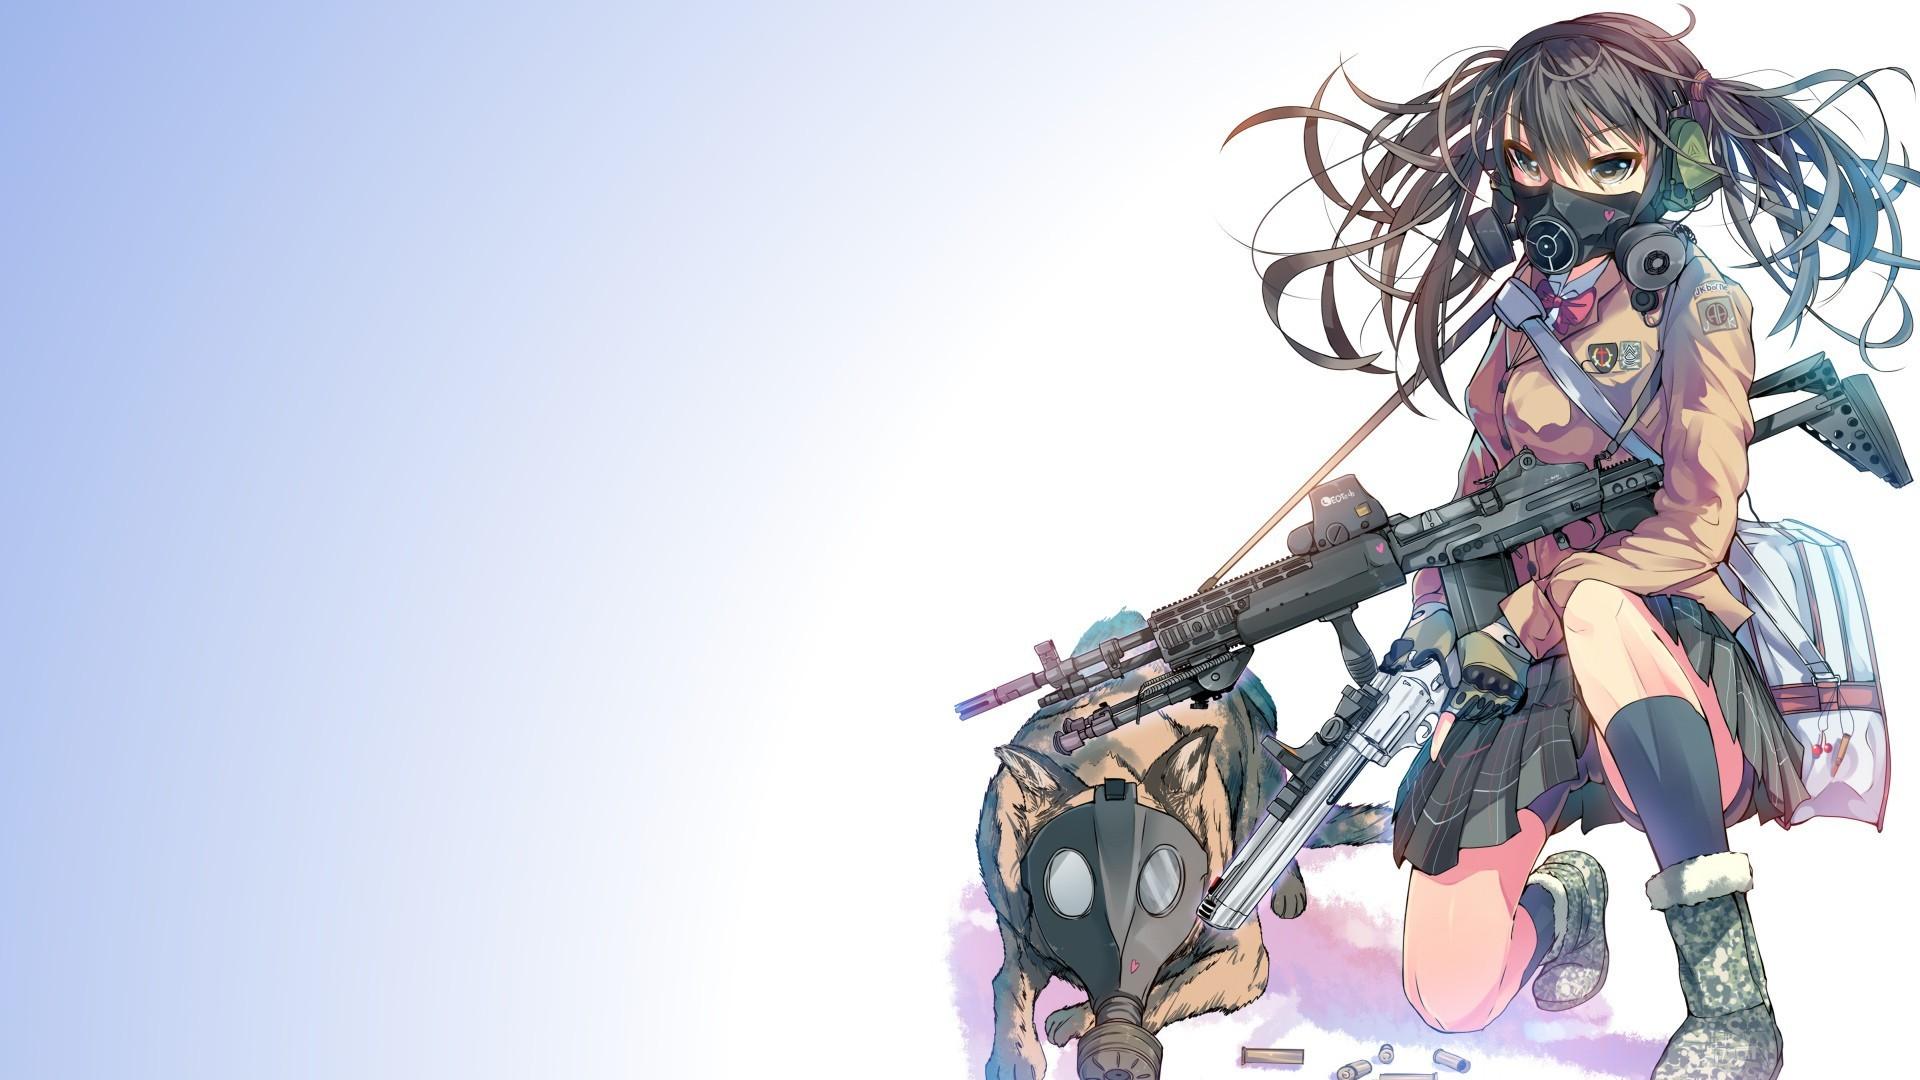 Anime gun wallpaper 61 images - Anime 1920x1080 ...